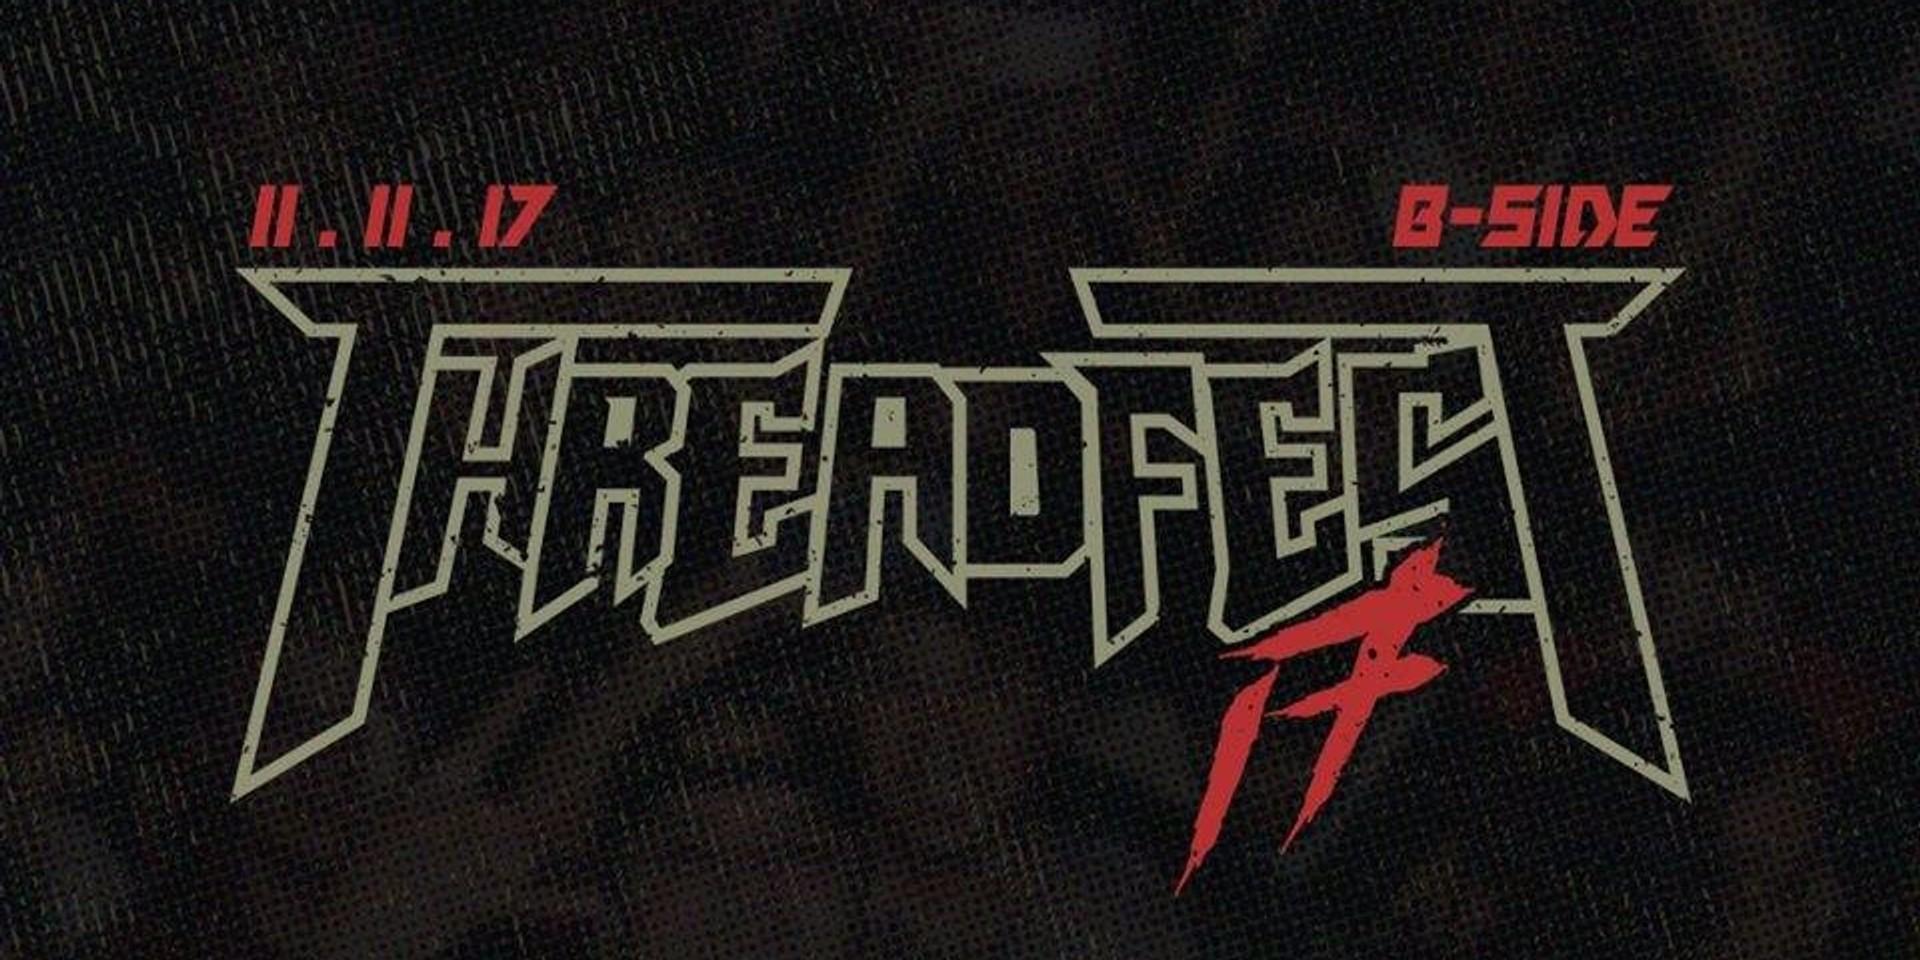 Threadfest Manila returns with Greyhoundz, Chicosci, Typecast, and more